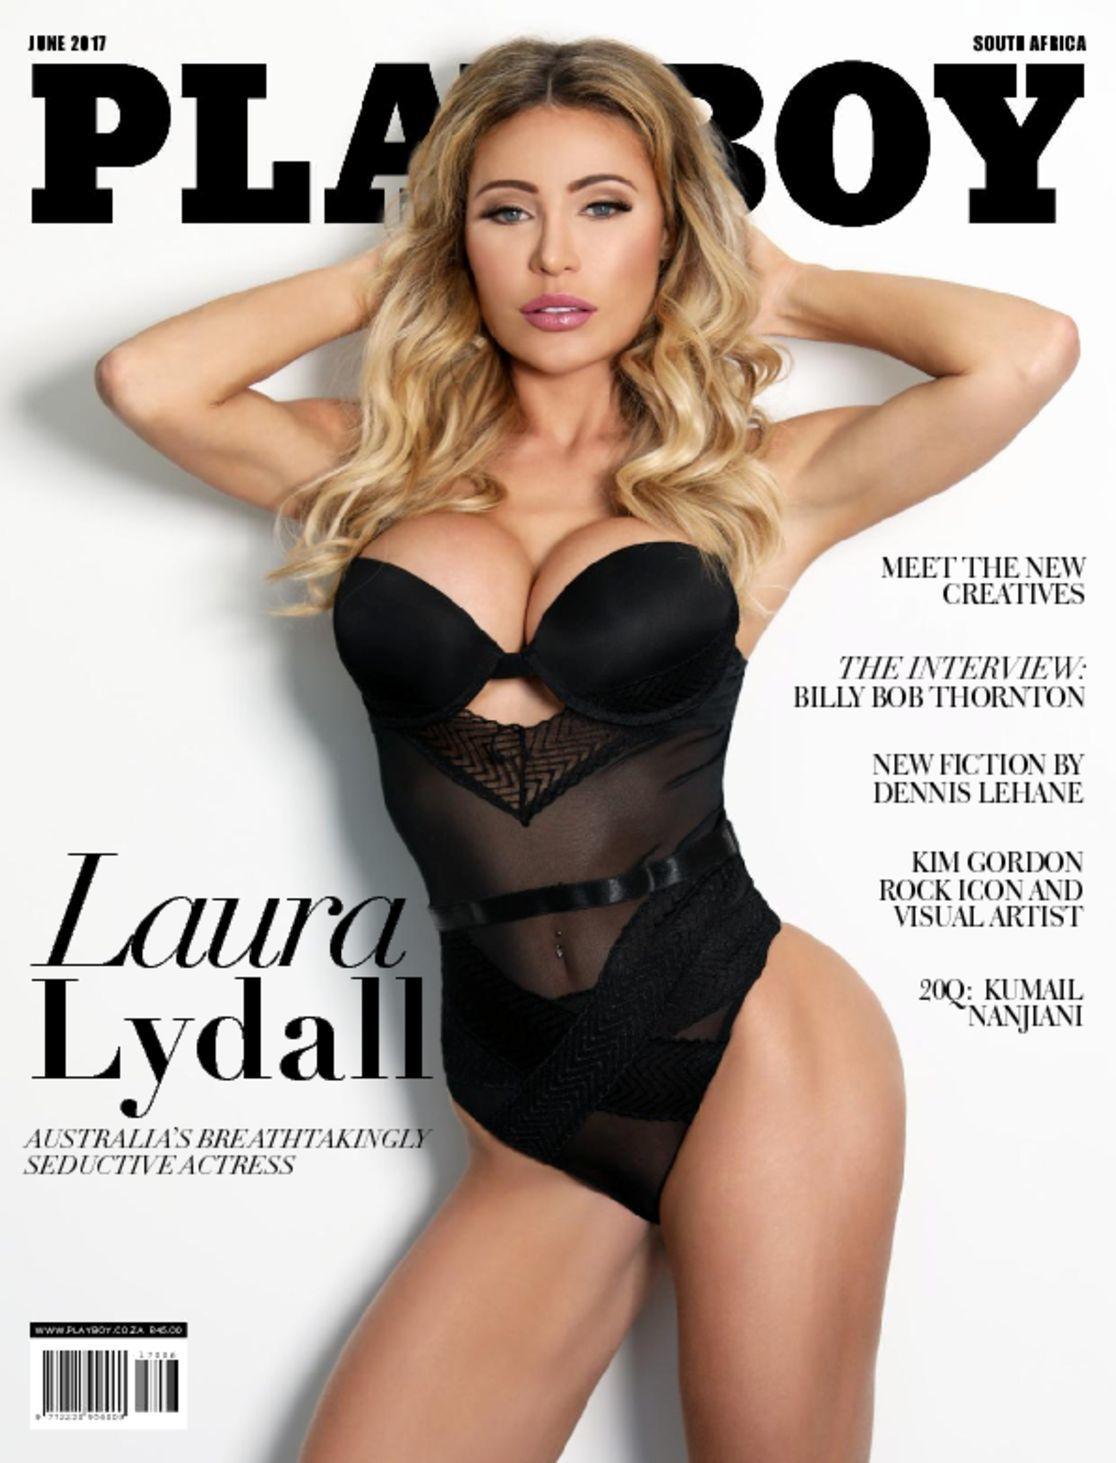 Laura Lydall